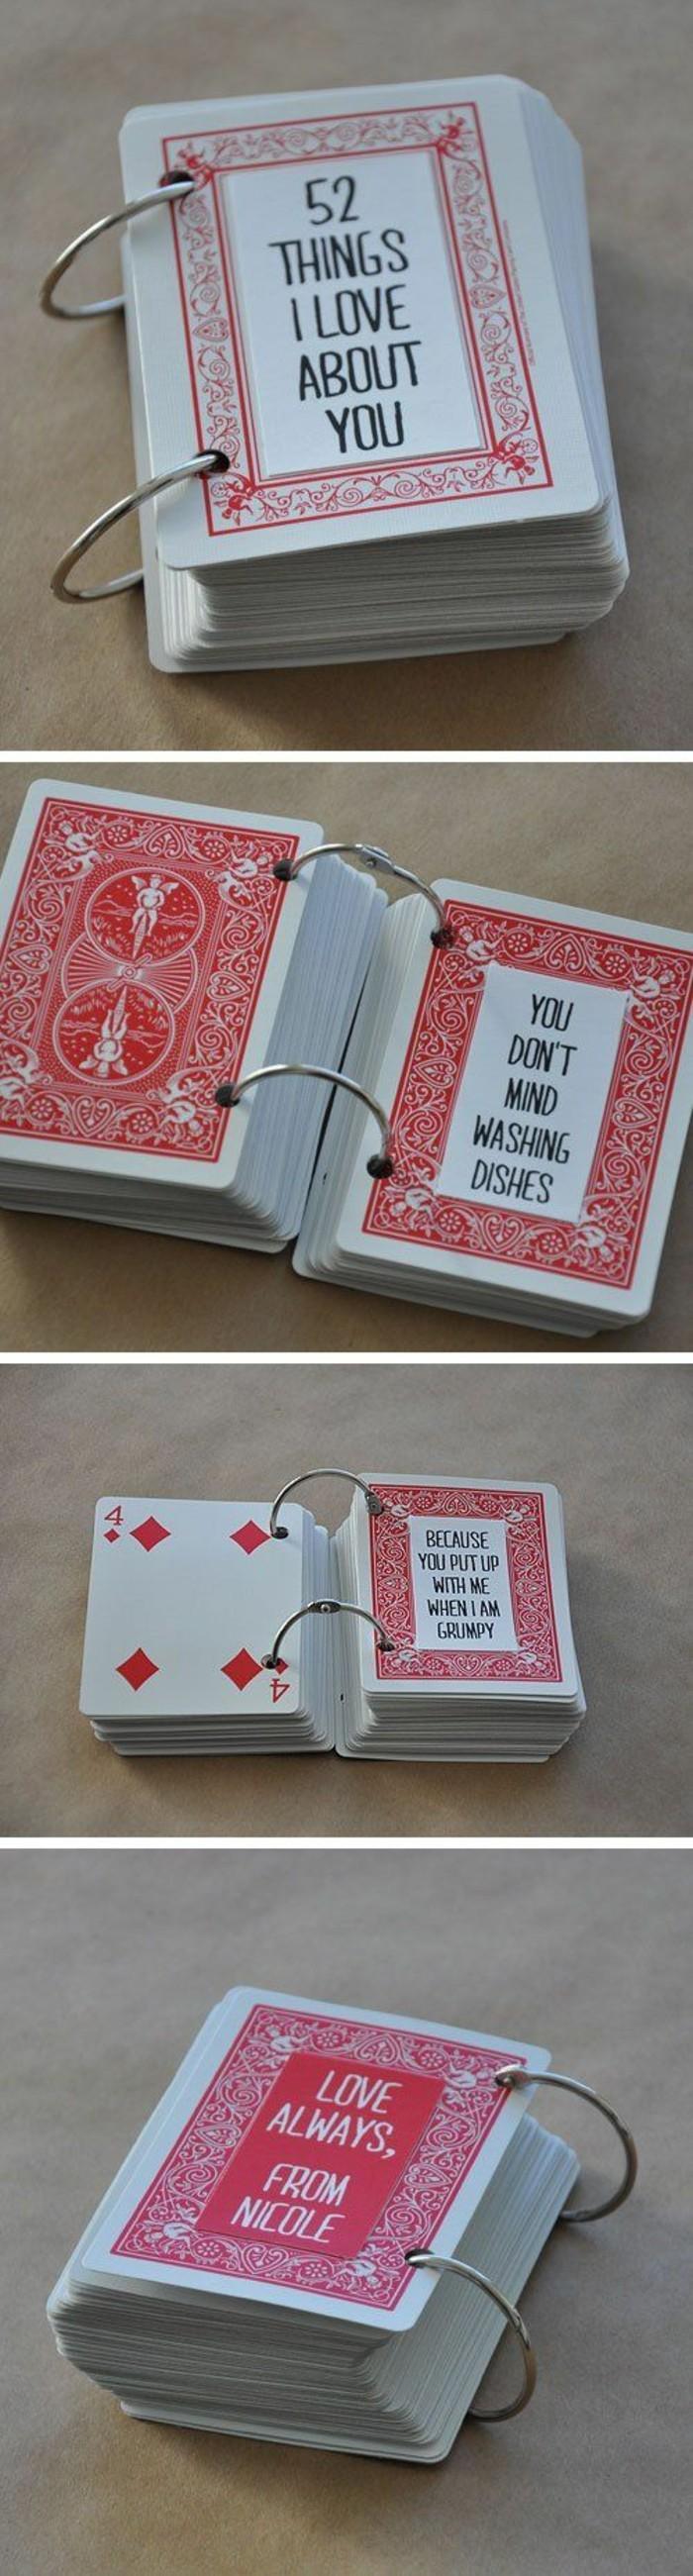 52 cosas que amo en ti, ideas de regalos caseros super románticos, manualidades san valentin